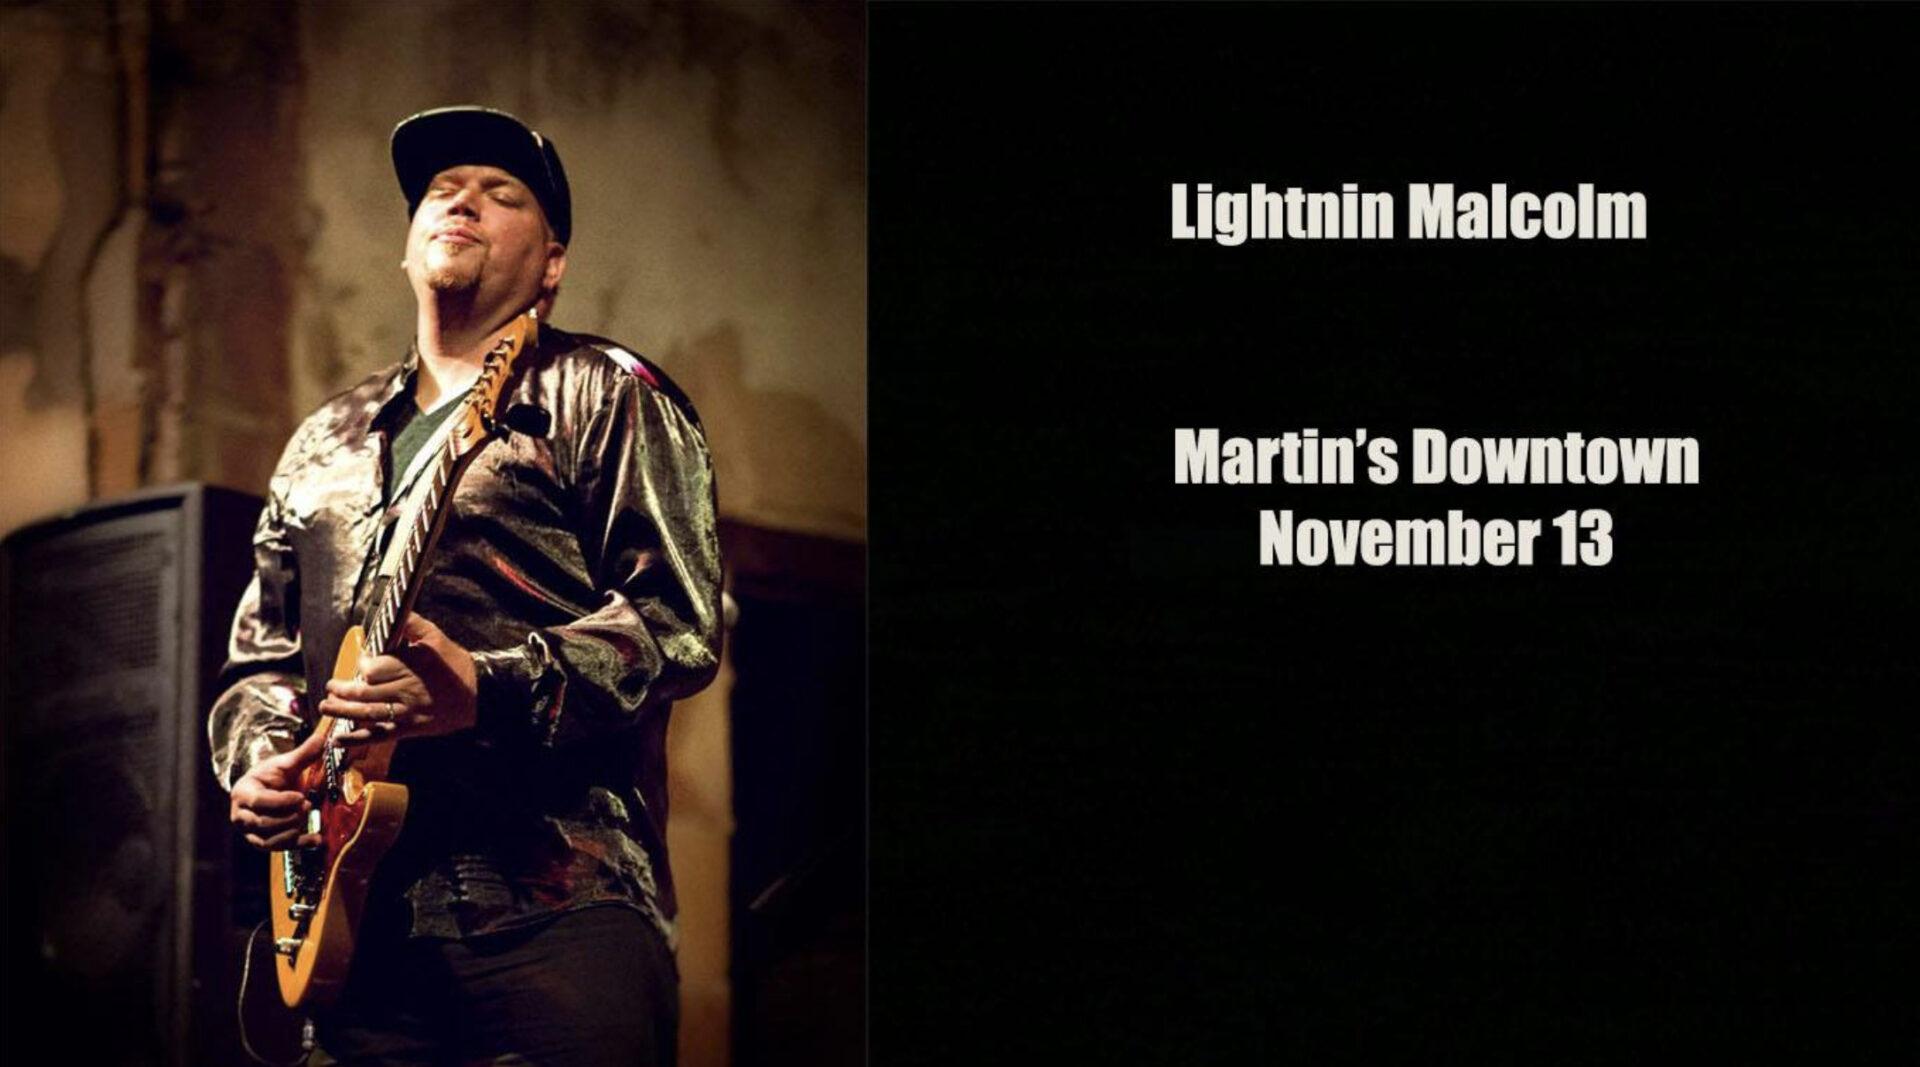 Lightnin Malcolm at Martin's Downtown